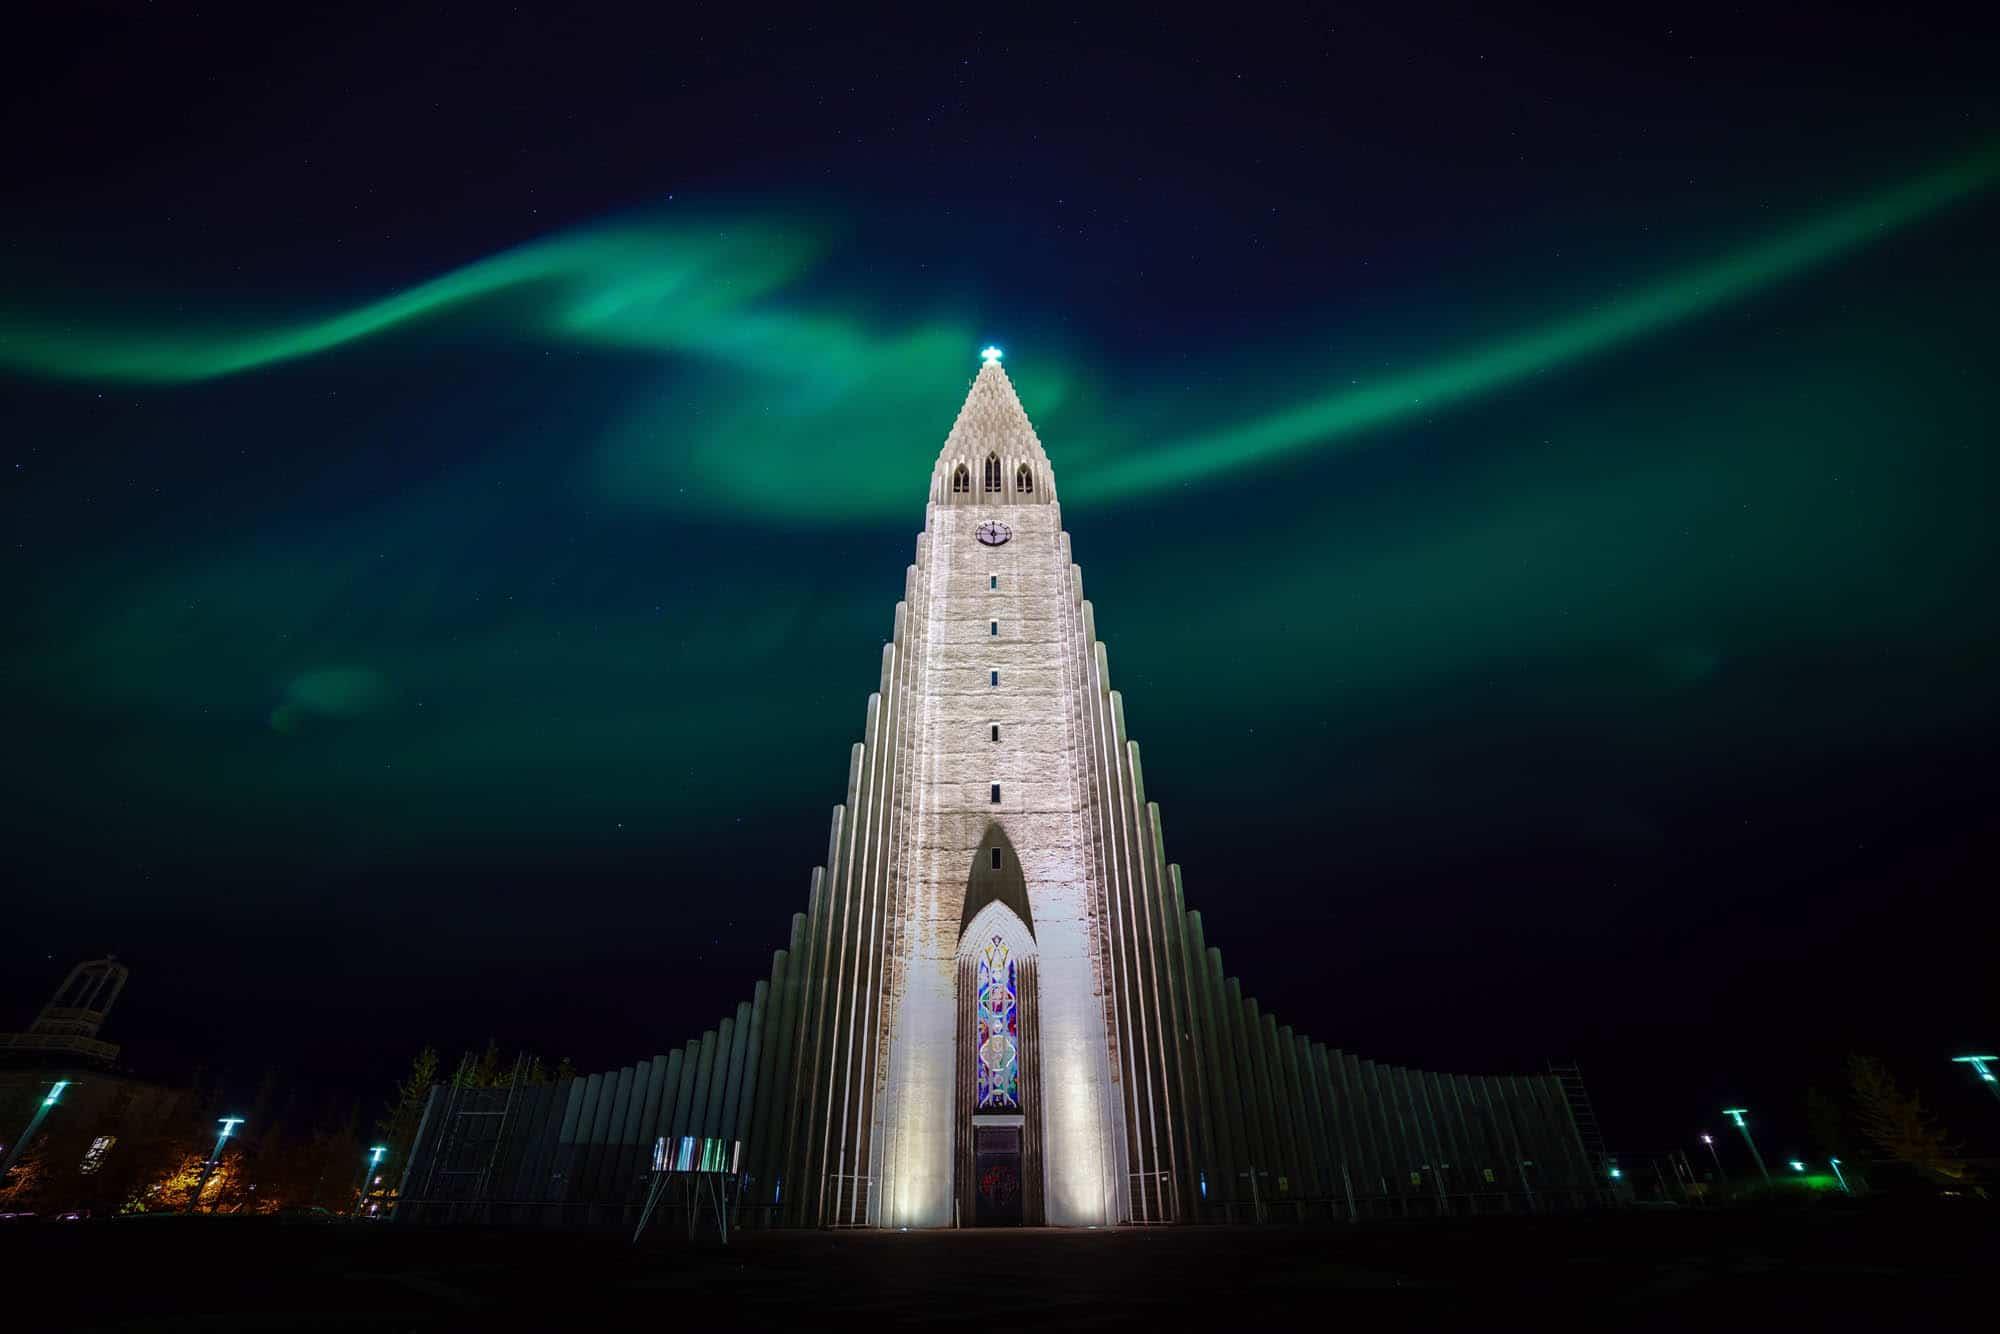 Northern lights over Hallgrimskirkja in Reyjkavik